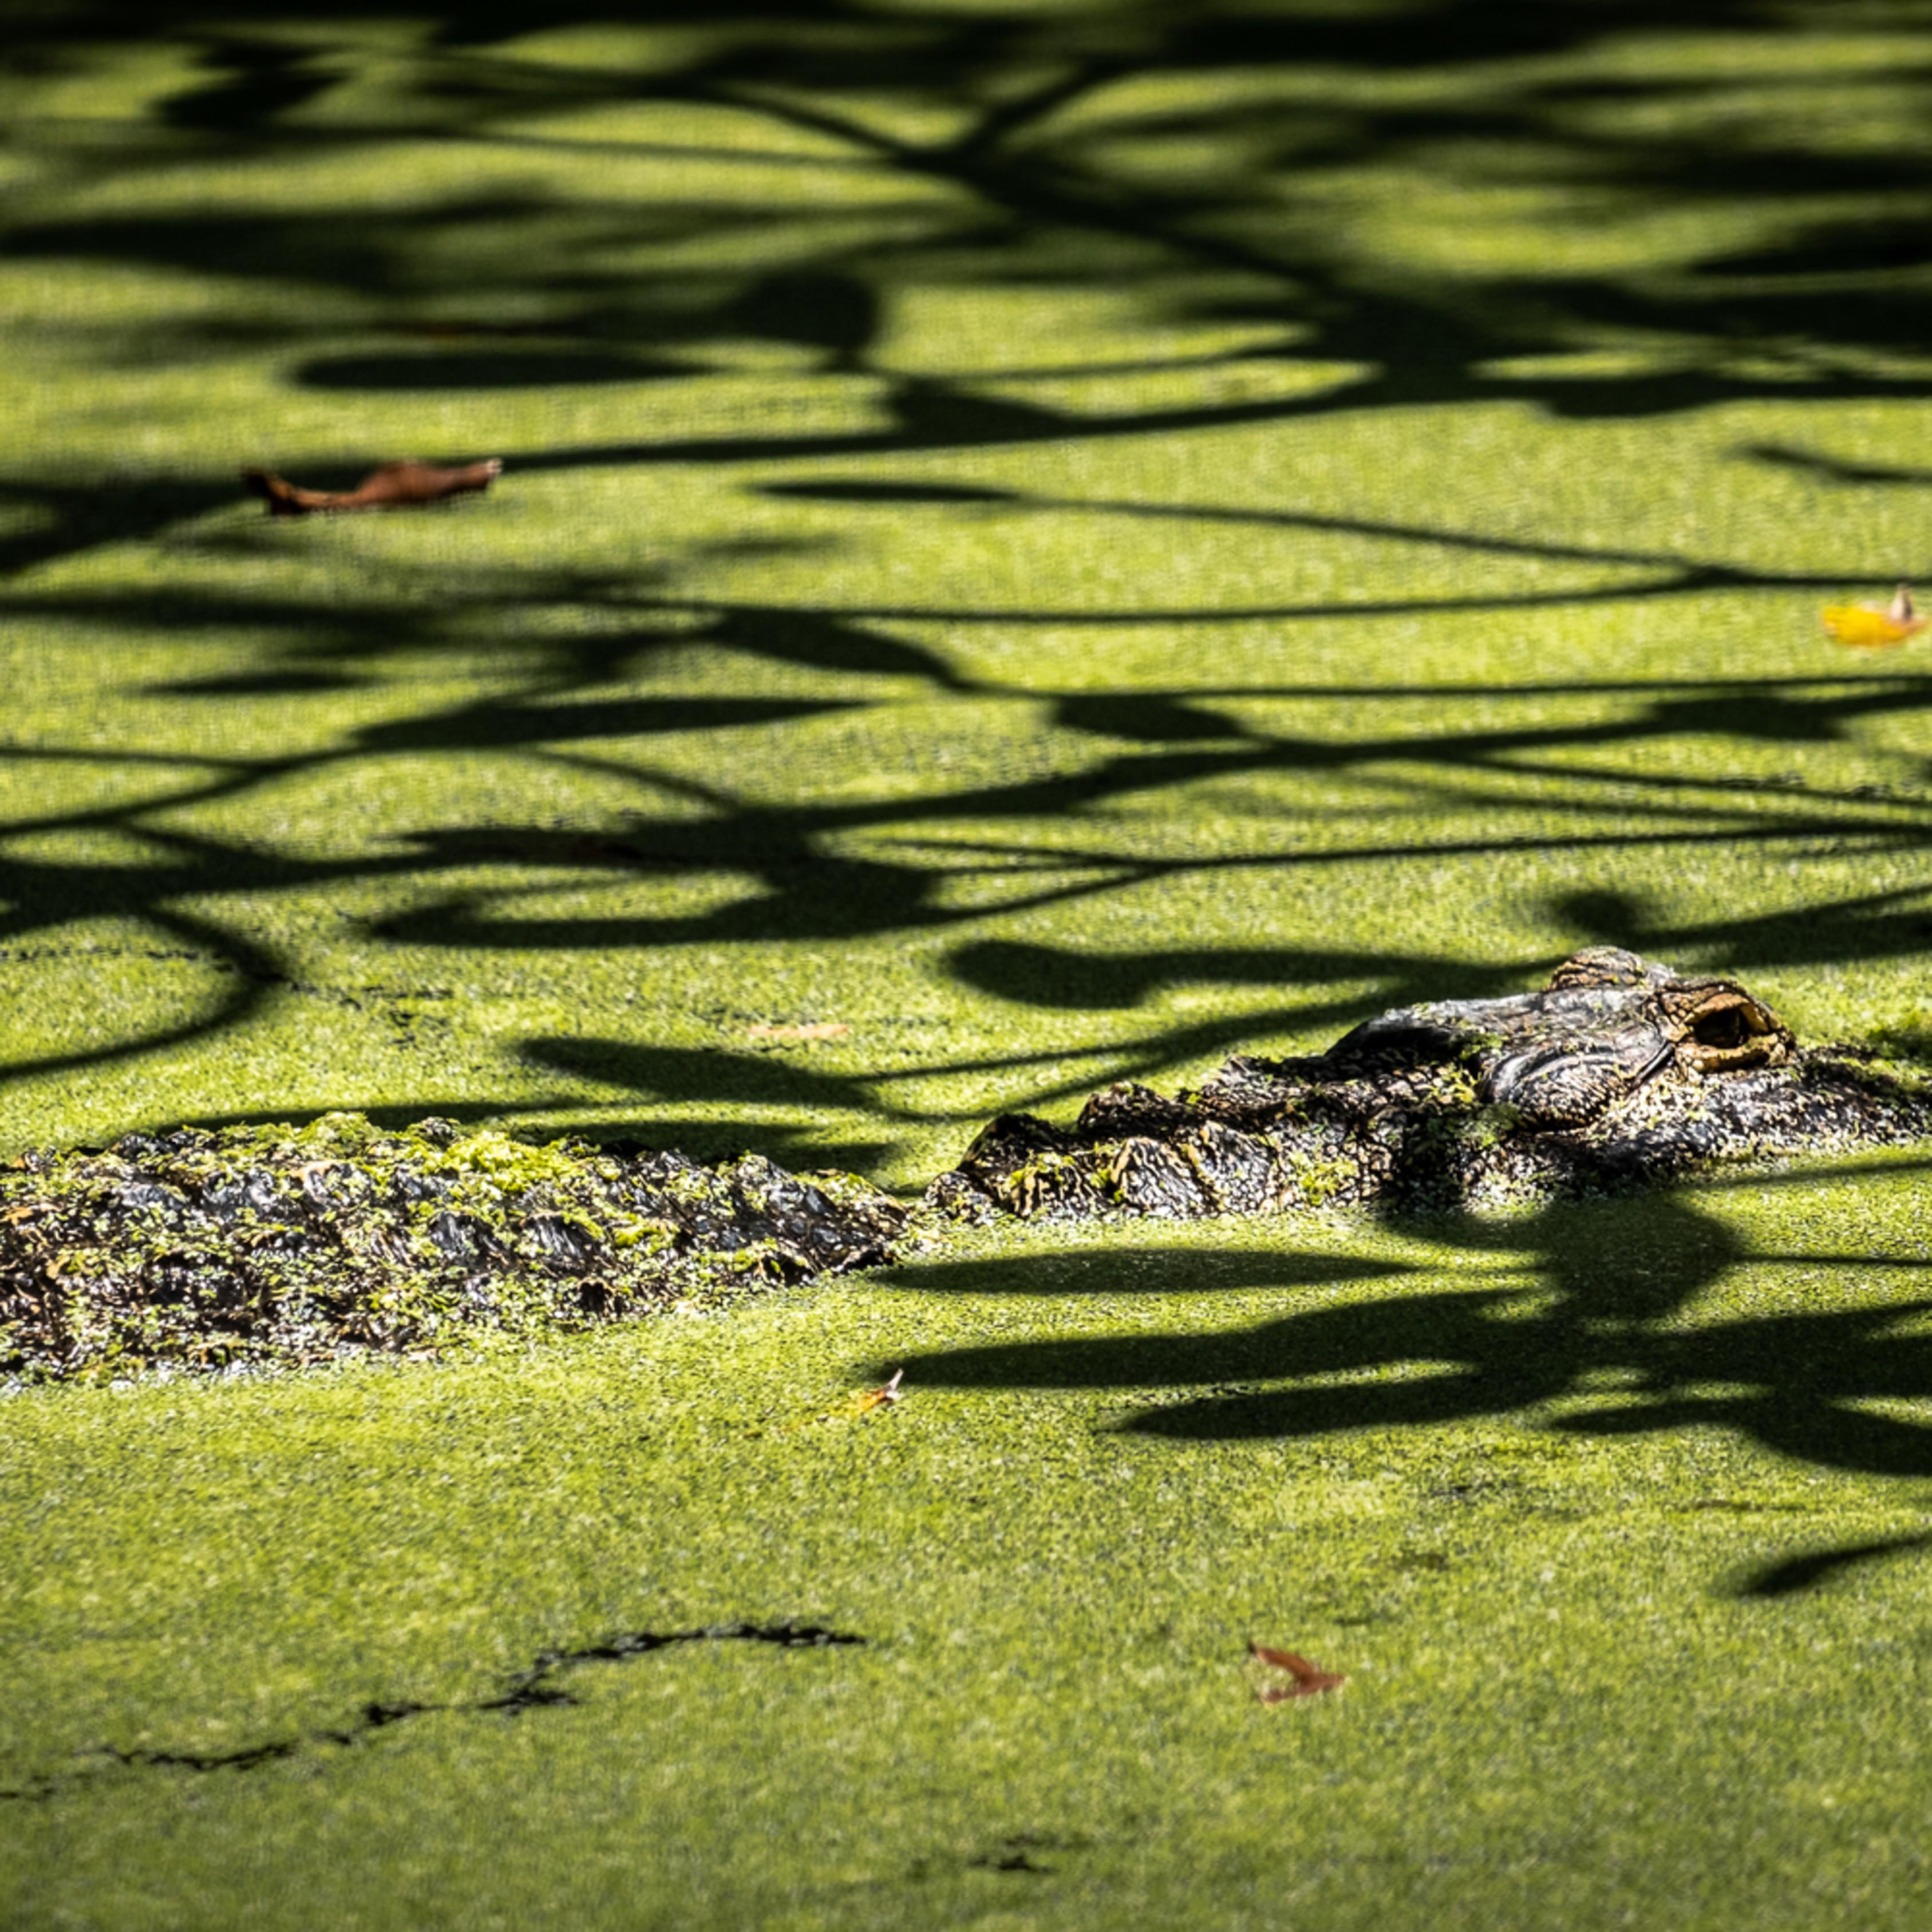 Swamp gator xiixqa